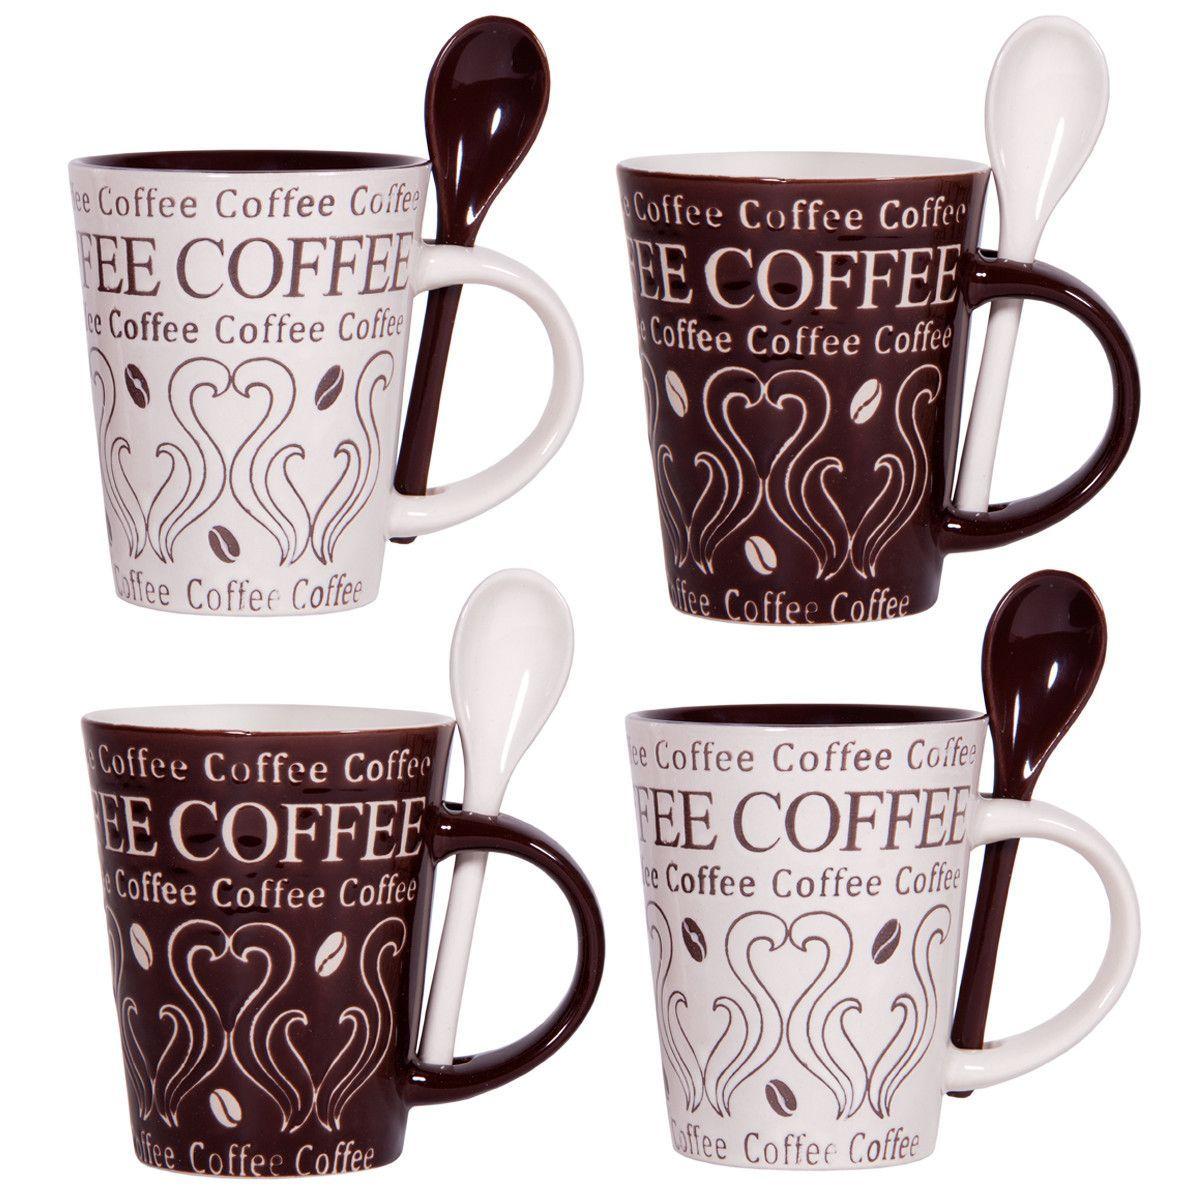 00c46546080 Coffee Swirl 10 oz. Mug and Spoon | Products | Mugs set, Coffee mugs ...